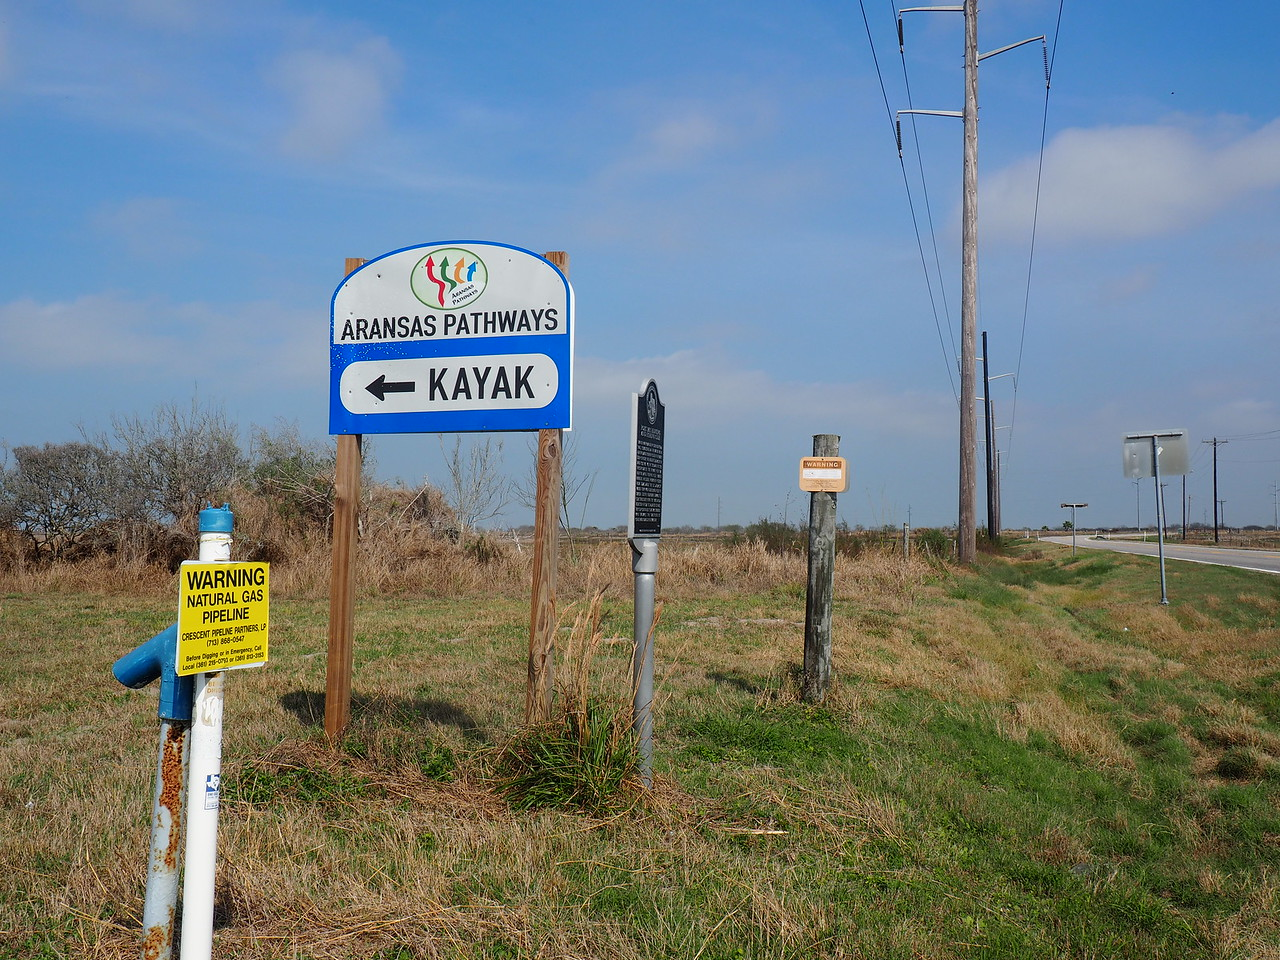 Port Bay Hunting and Fishing Club - Historic Marker